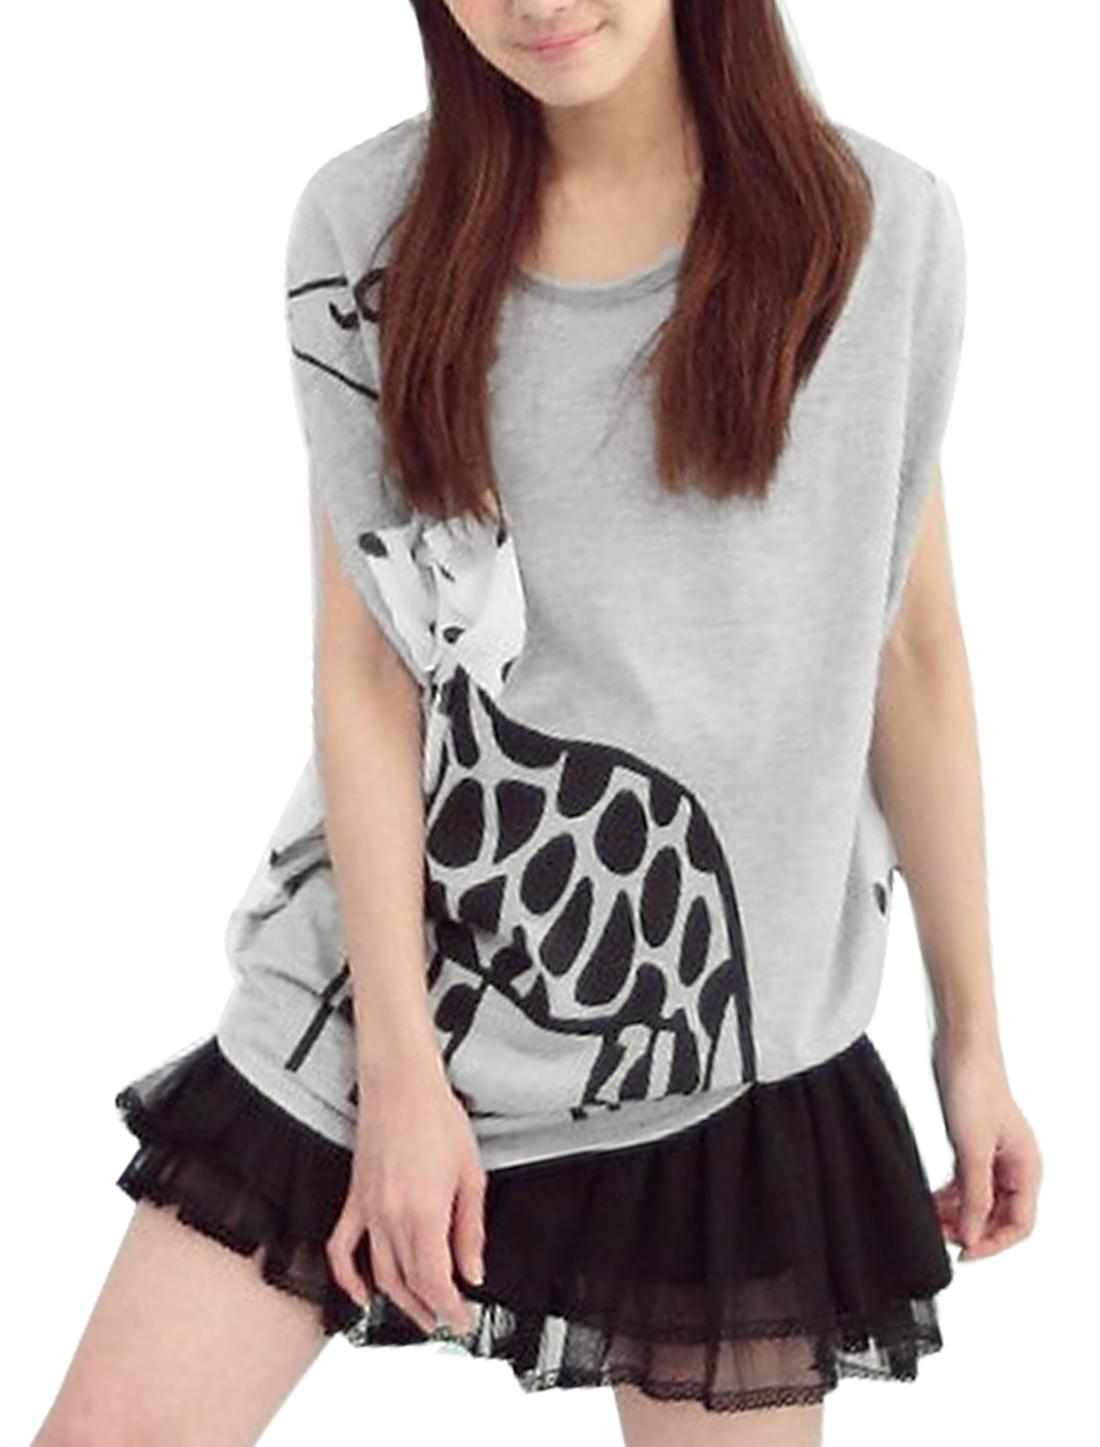 Ladies Chic Light Gray Scoop Neck Short Dolman Sleeve Casual Shirt XS